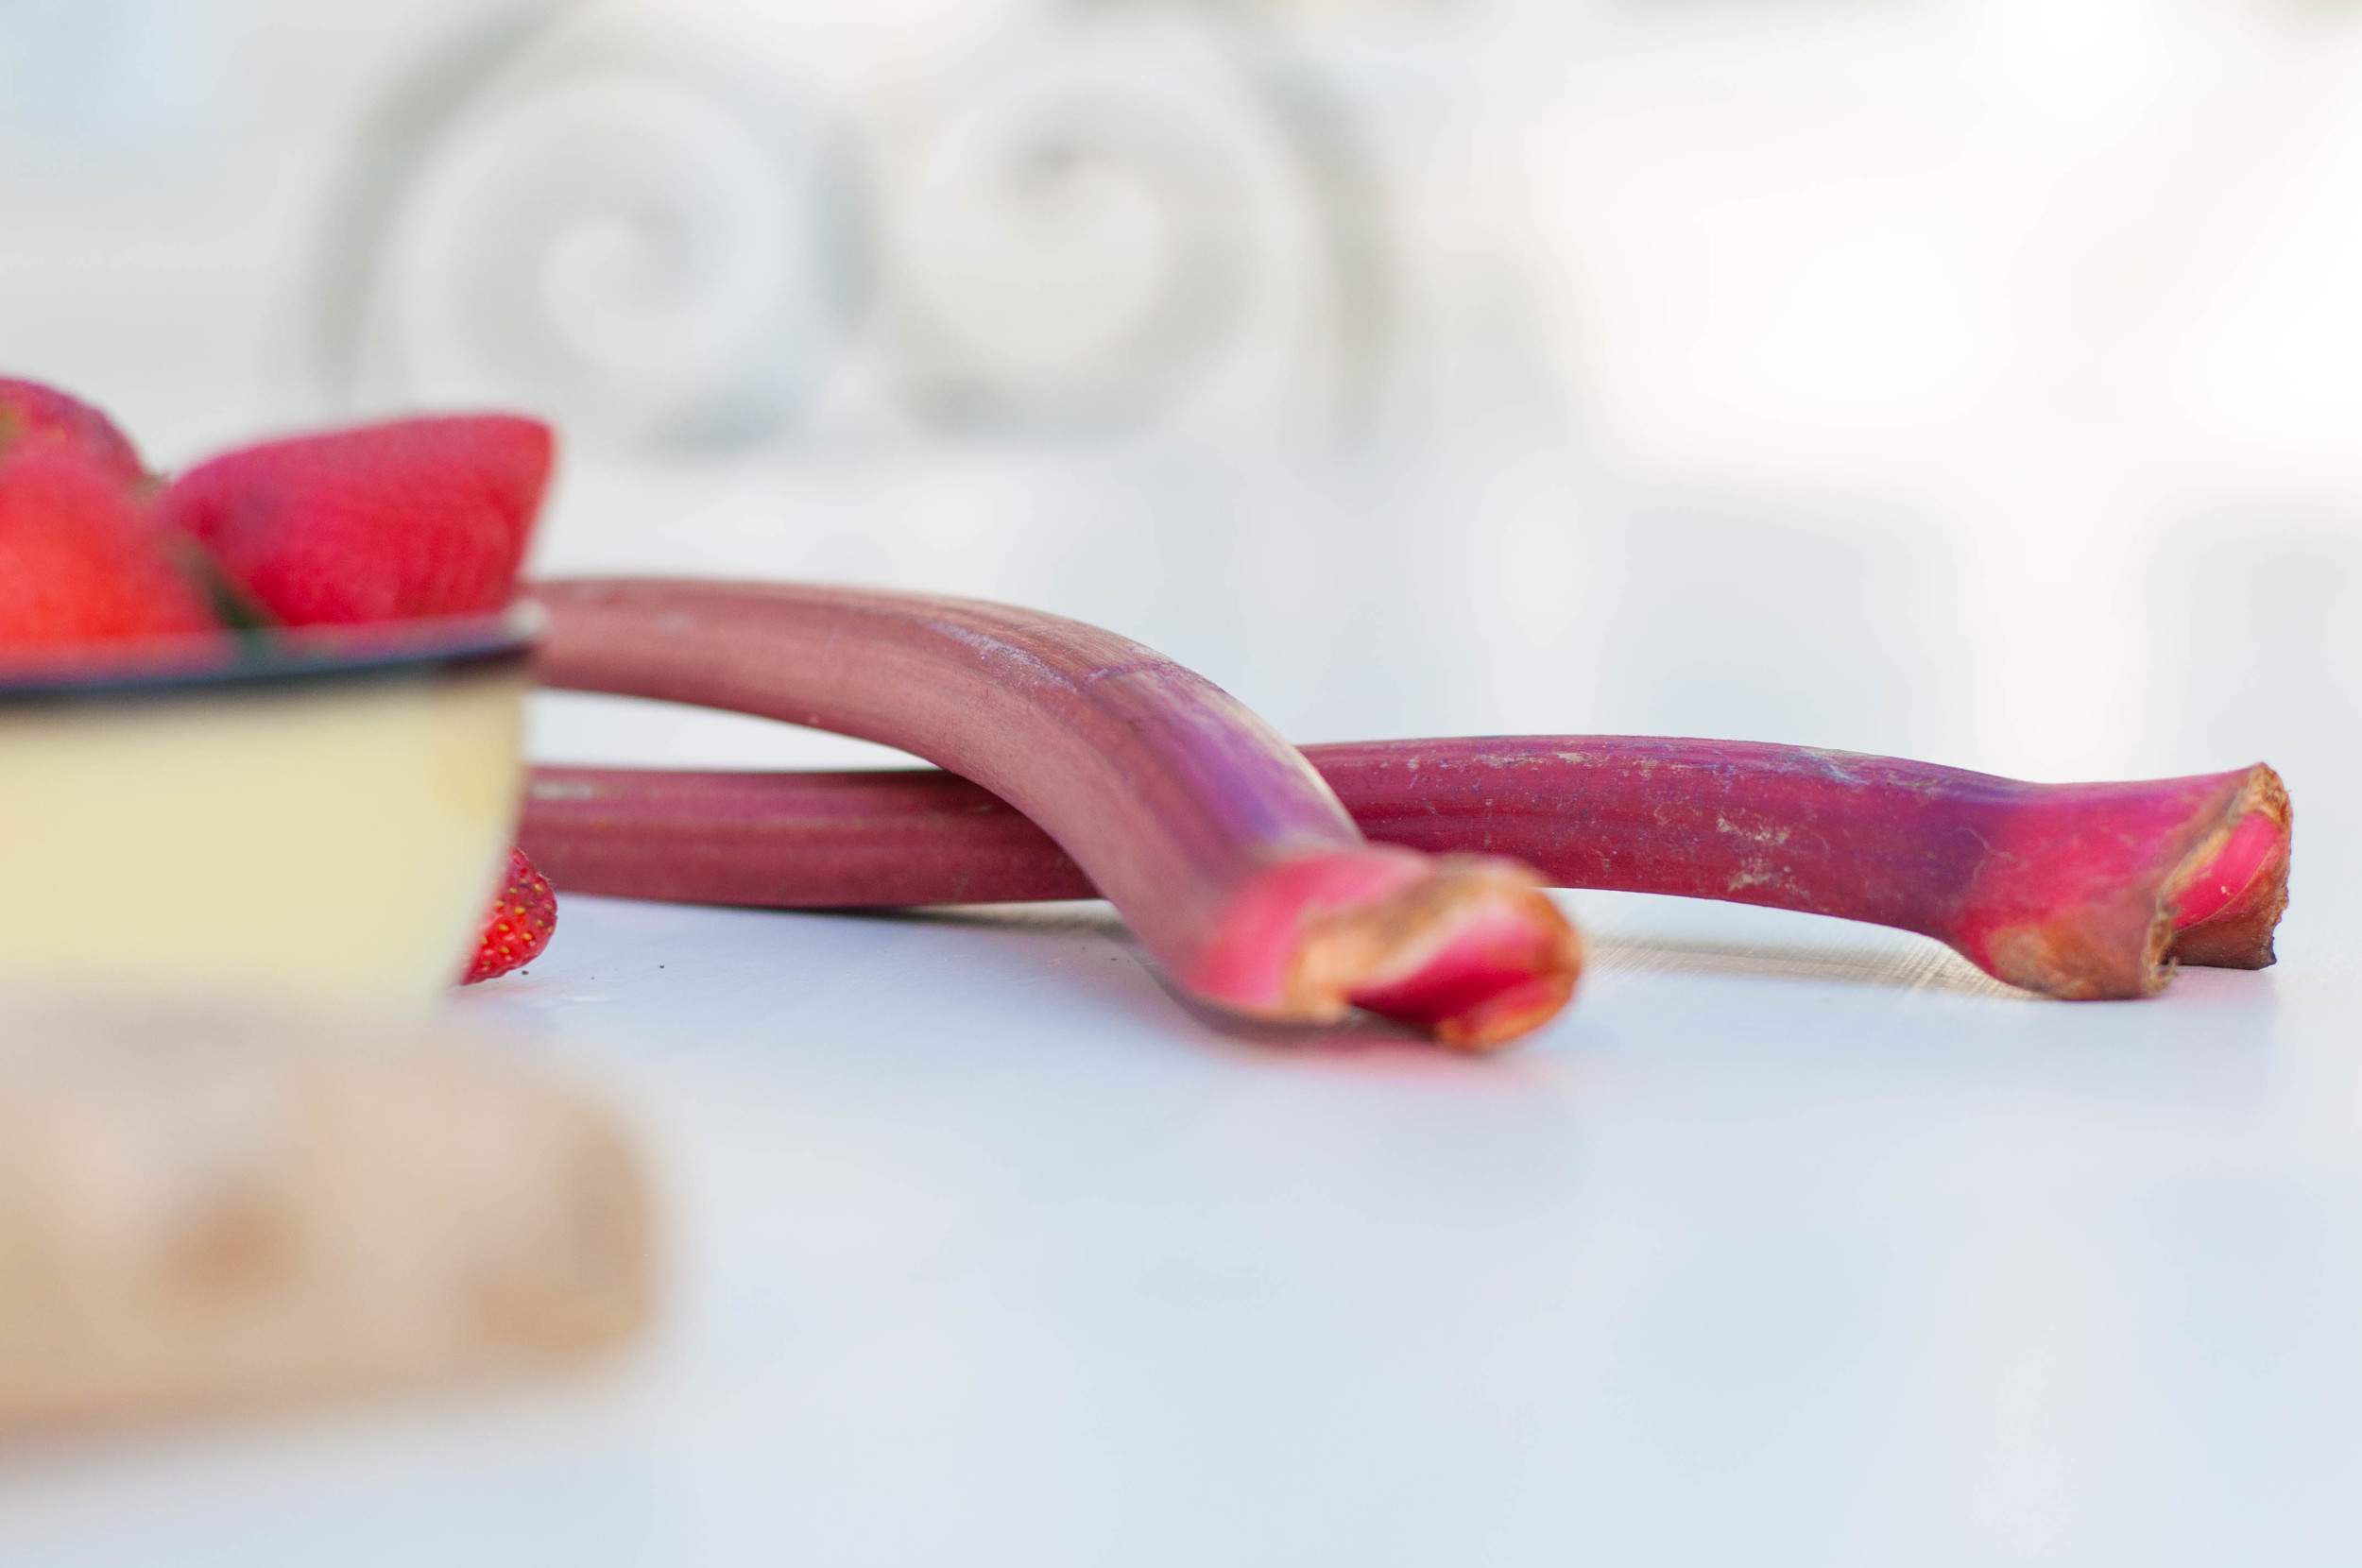 rhubarb-strawberry-ginger-juice-fried-parsley